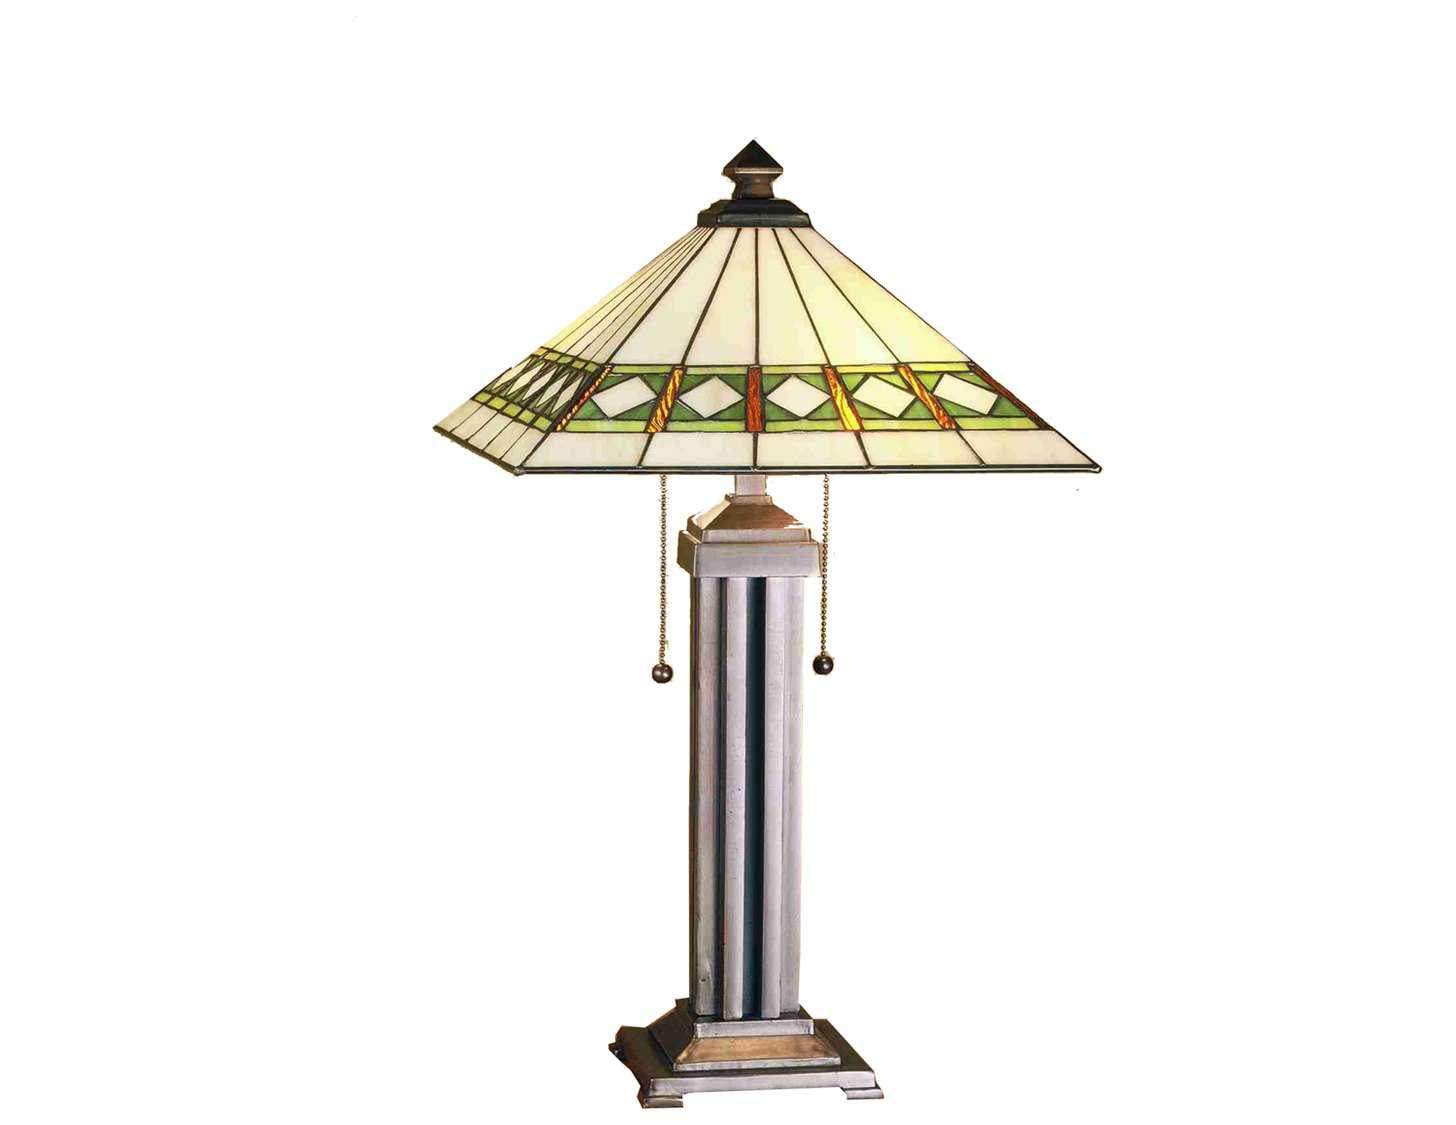 meyda tiffany diamond mission multi color table lamp my38689. Black Bedroom Furniture Sets. Home Design Ideas